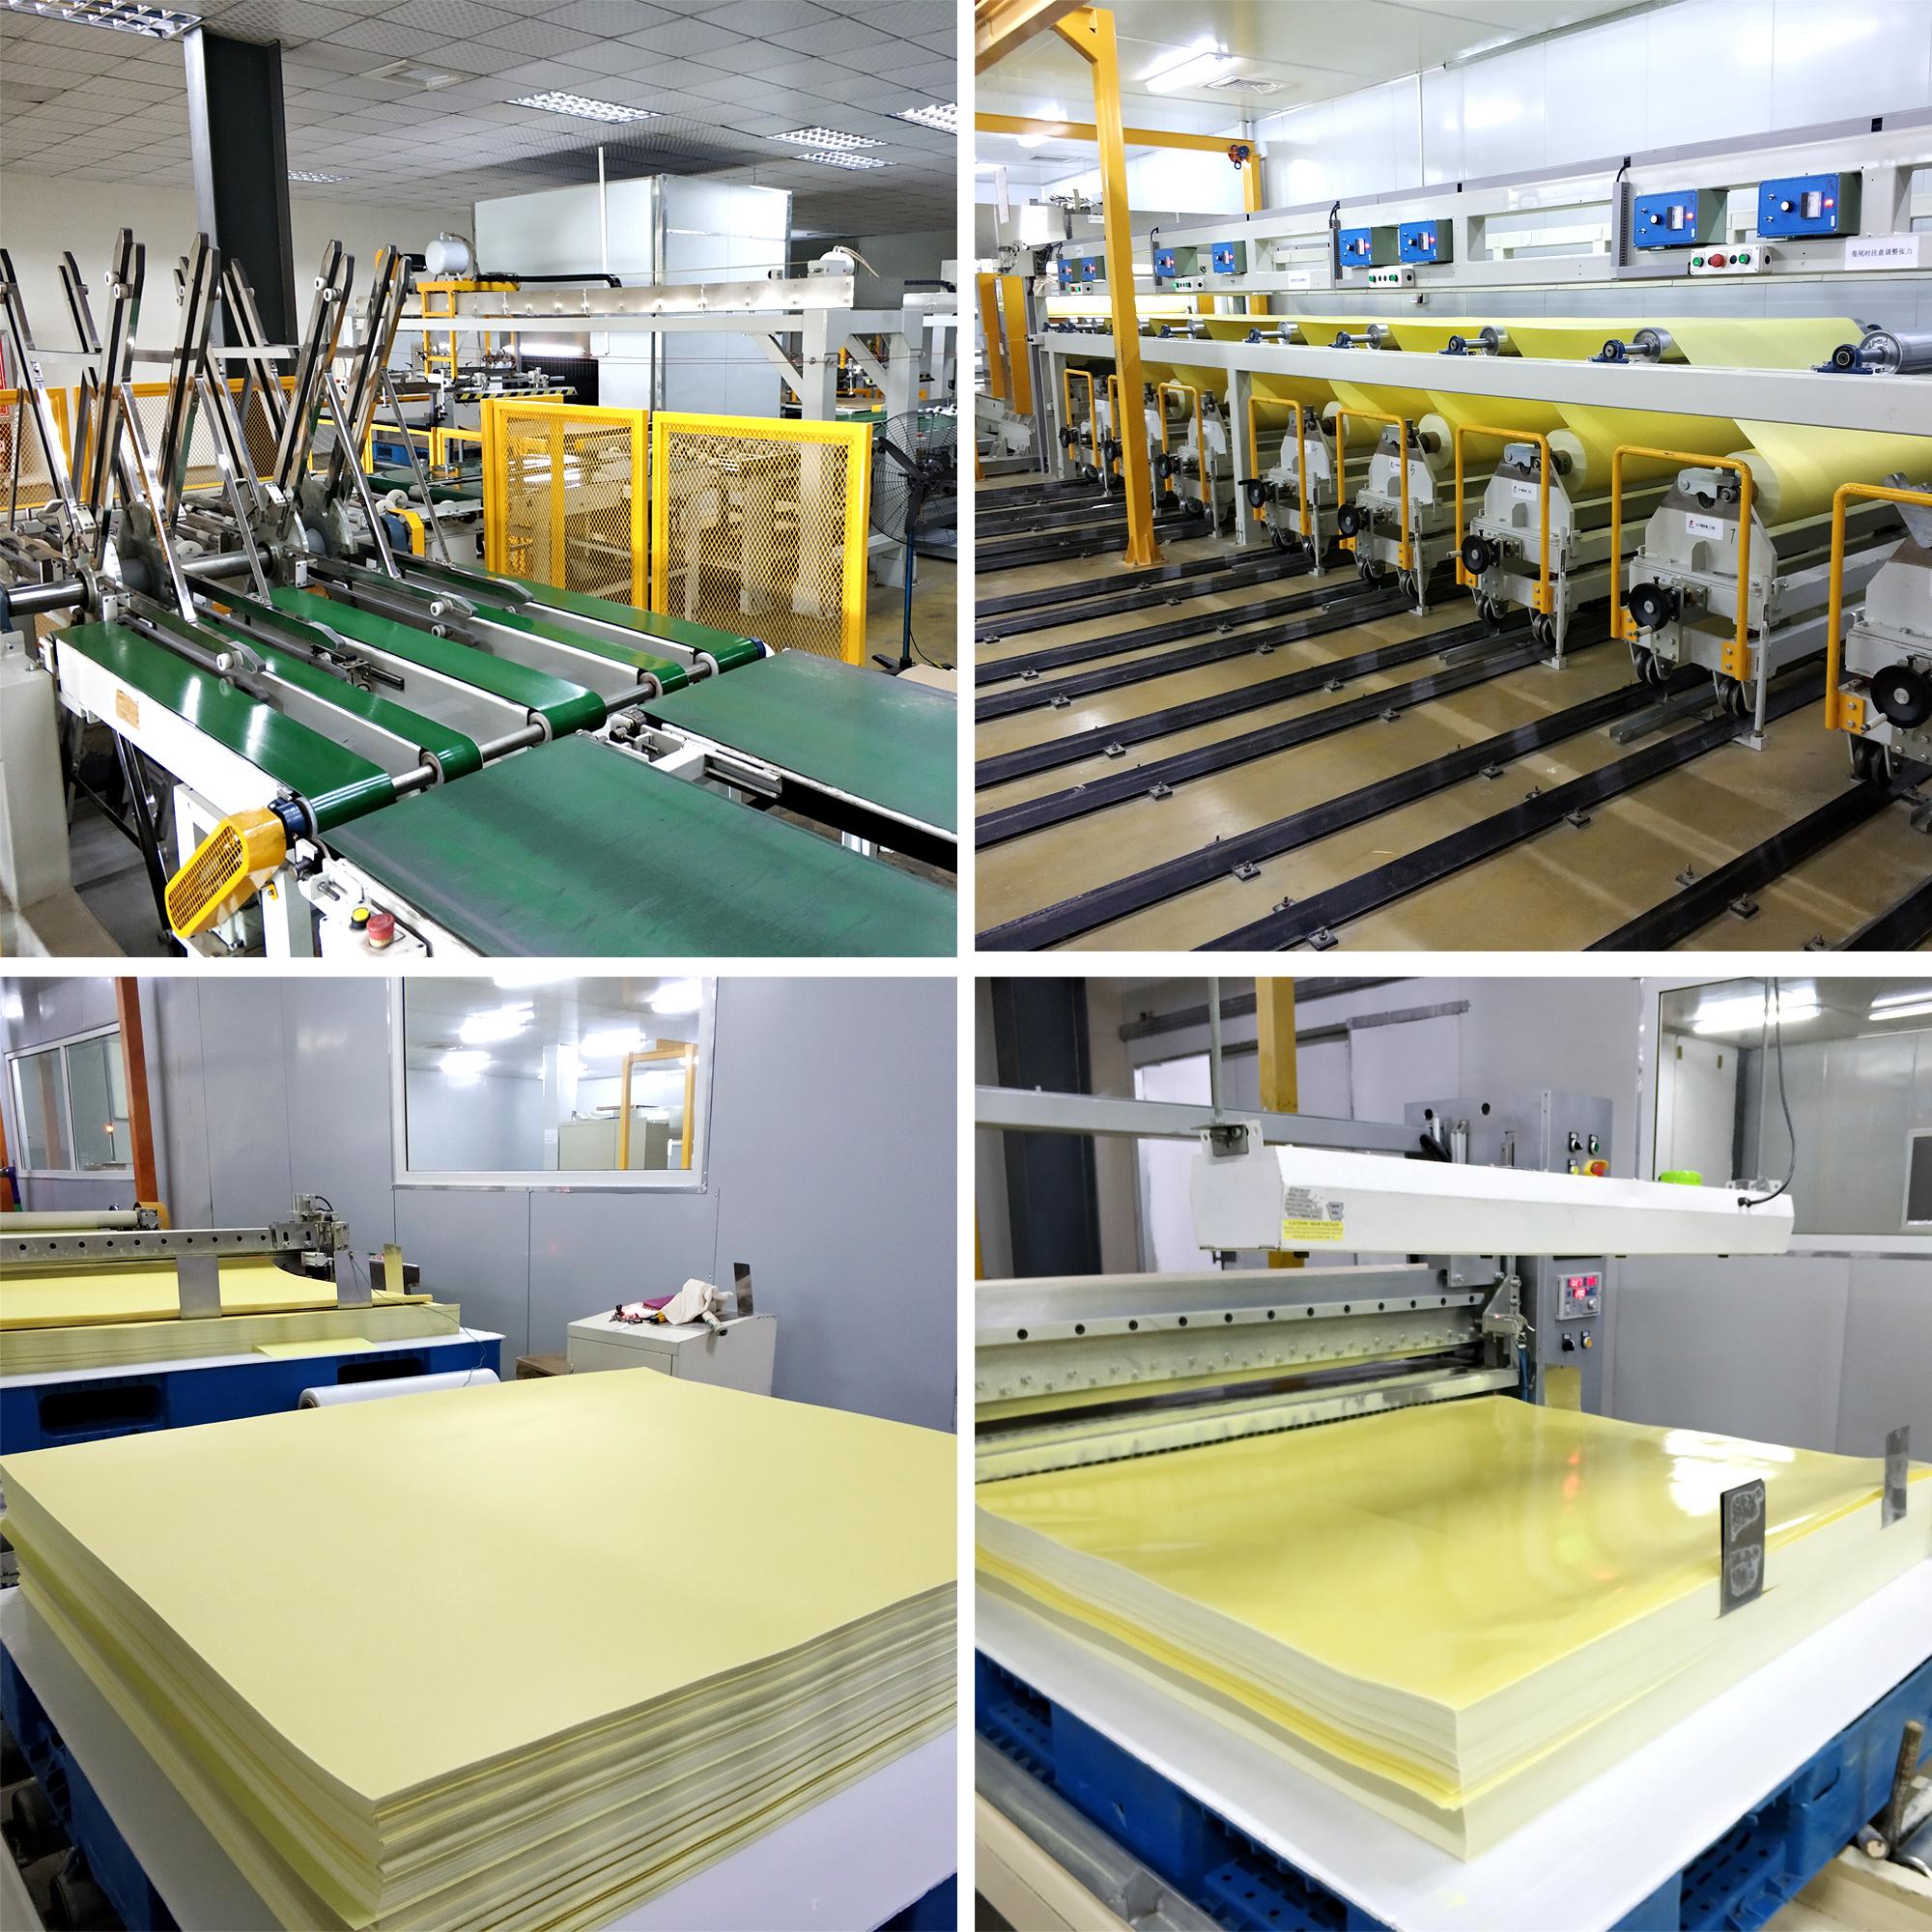 Fr4 epoxy sheet